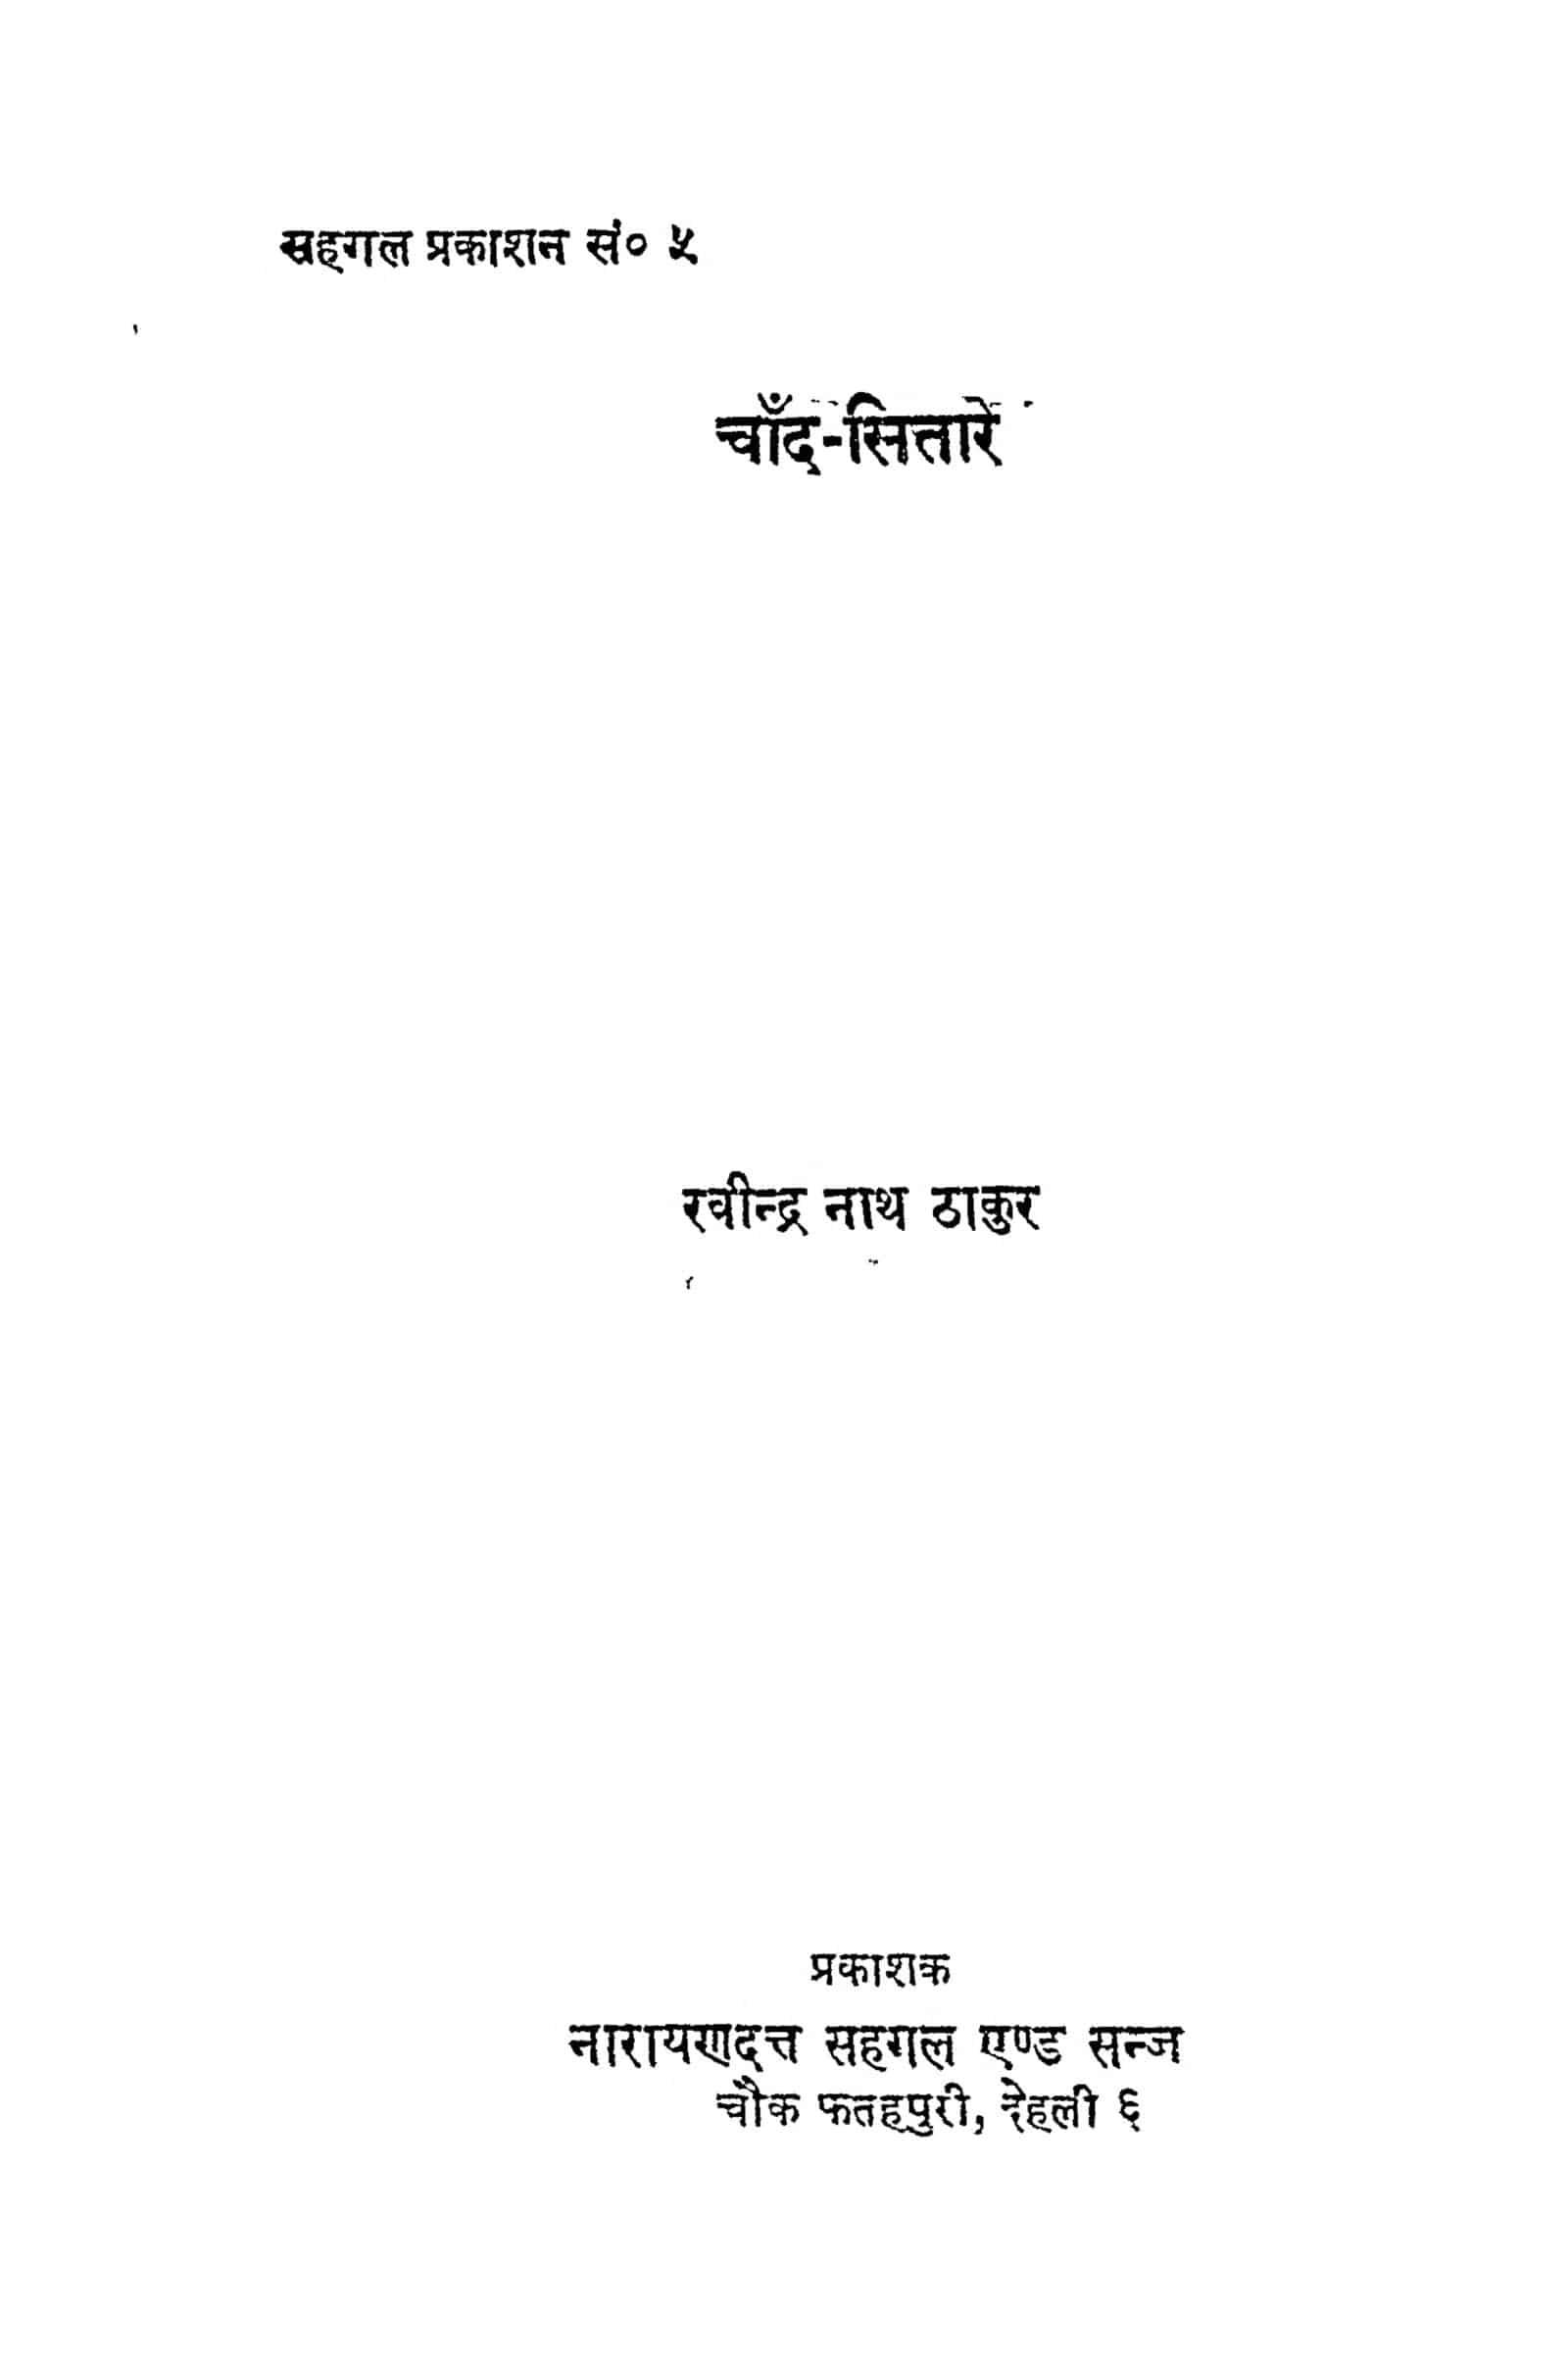 Chand - Sitare by रवीन्द्रनाथ ठाकुर - Ravindranath Thakur